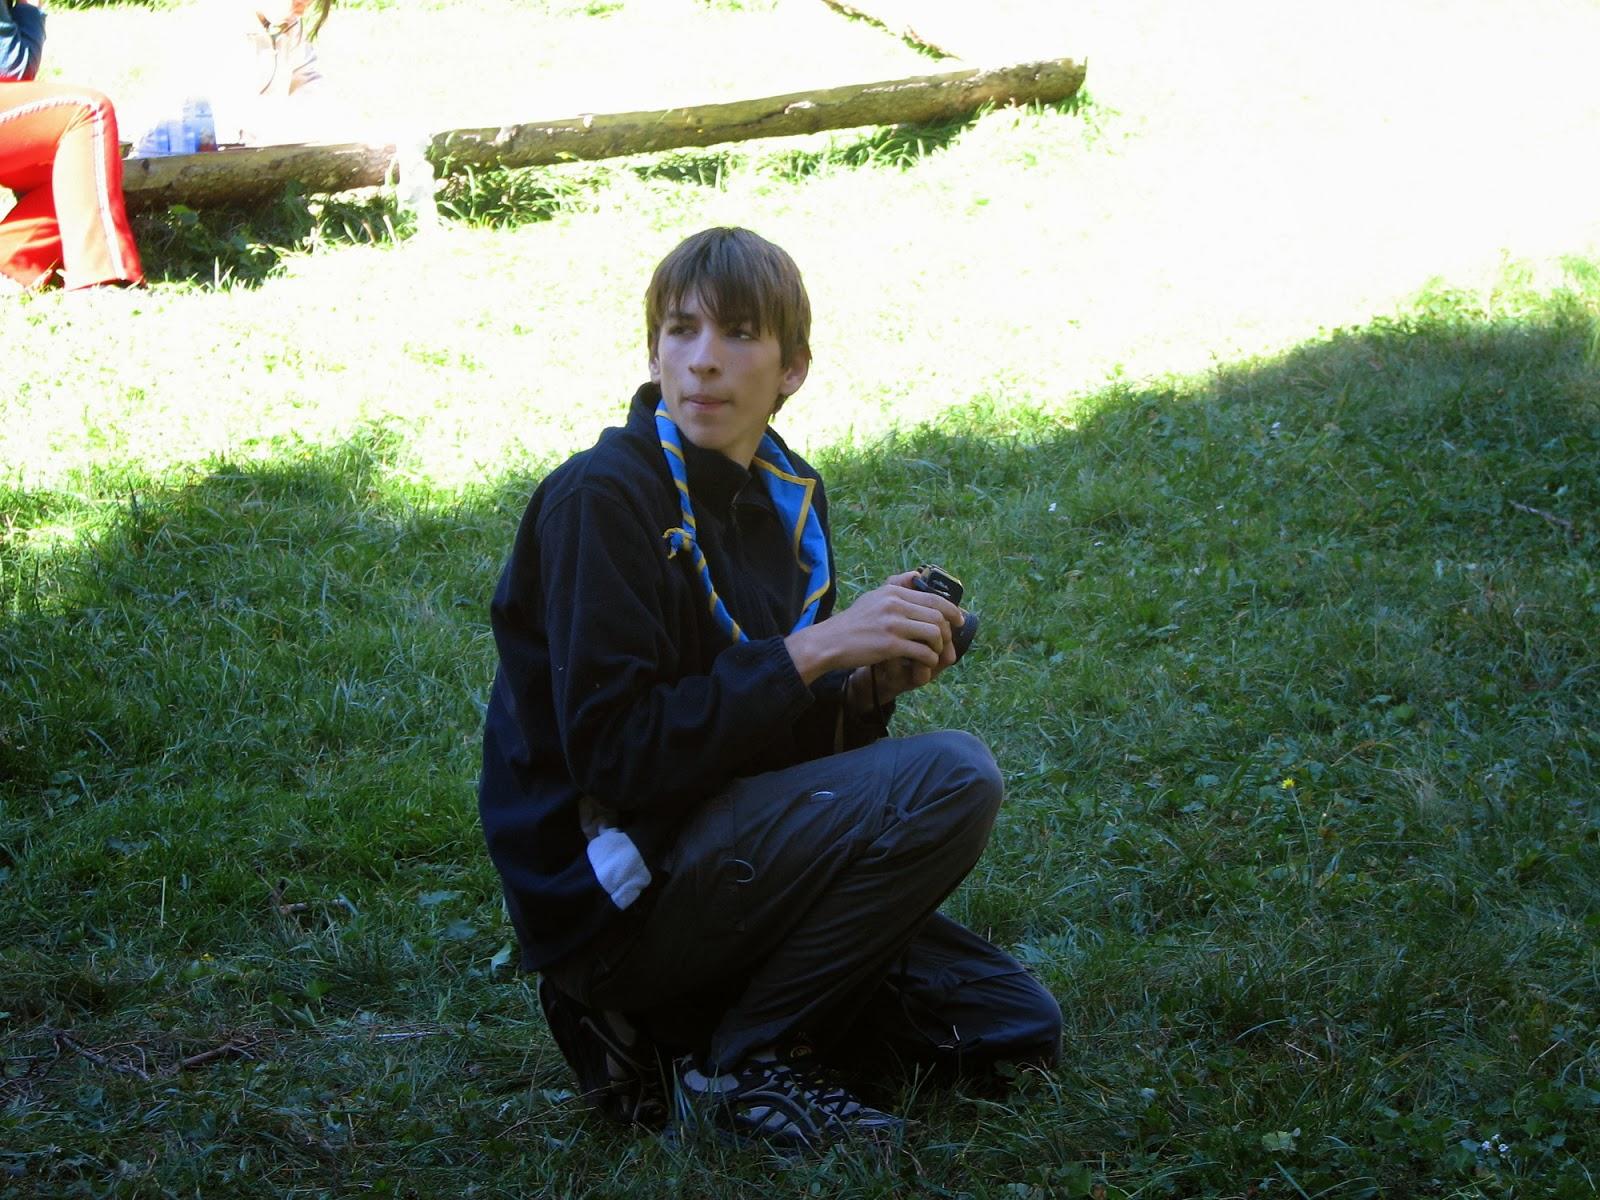 Vodov izlet, Ilirska Bistrica 2005 - Picture%2B152.jpg